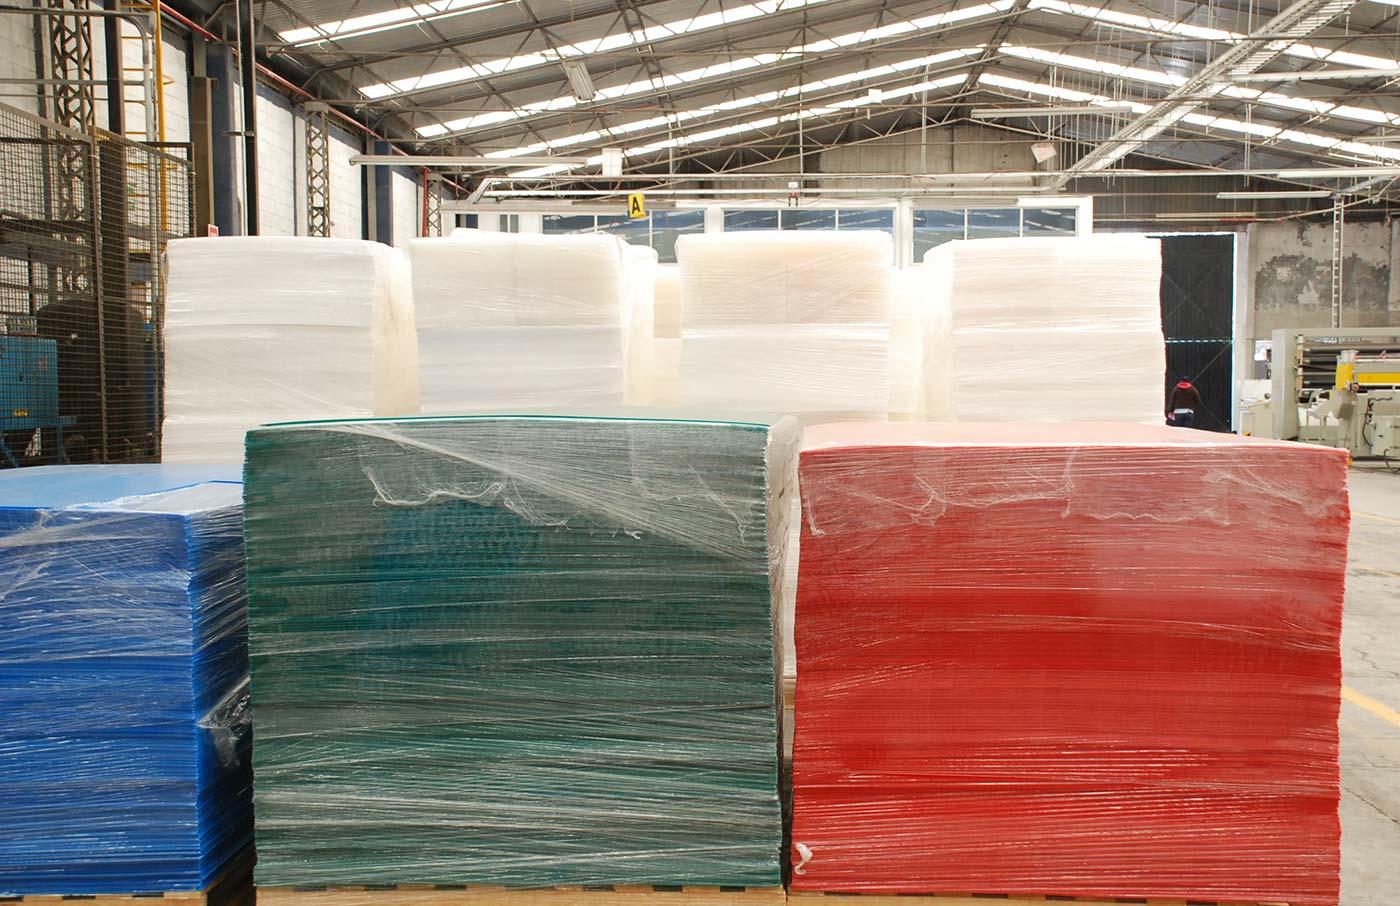 fabricantes Airplast® Corrugado Plastico